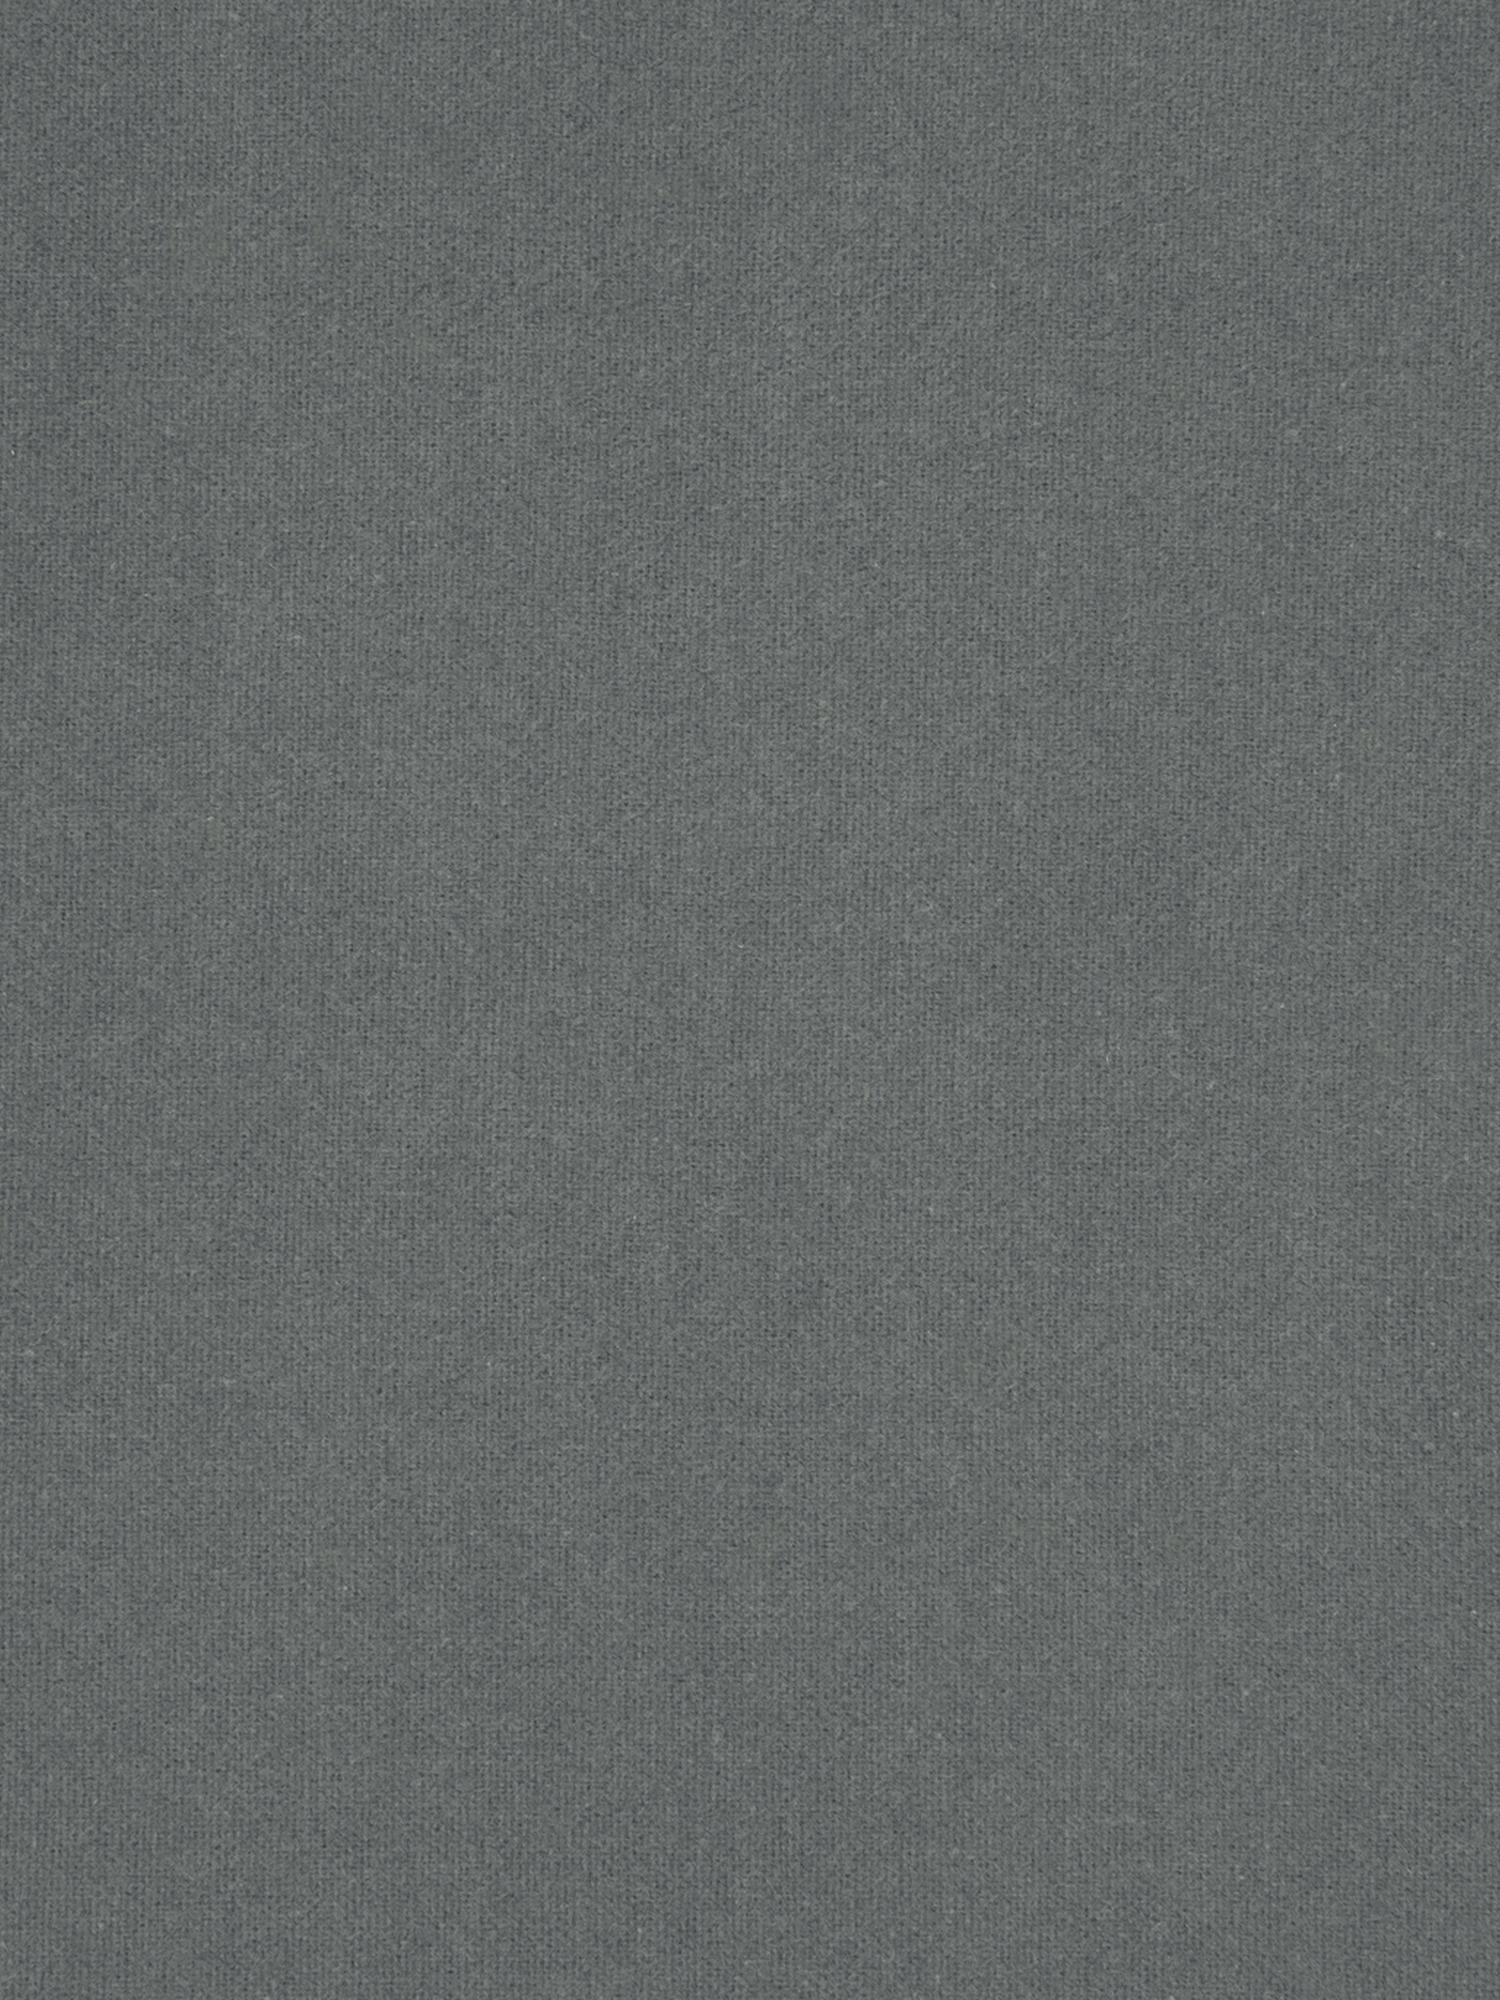 Spannbettlaken Biba in Dunkelgrau, Flanell, Webart: Flanell, Dunkelgrau, 180 x 200 cm